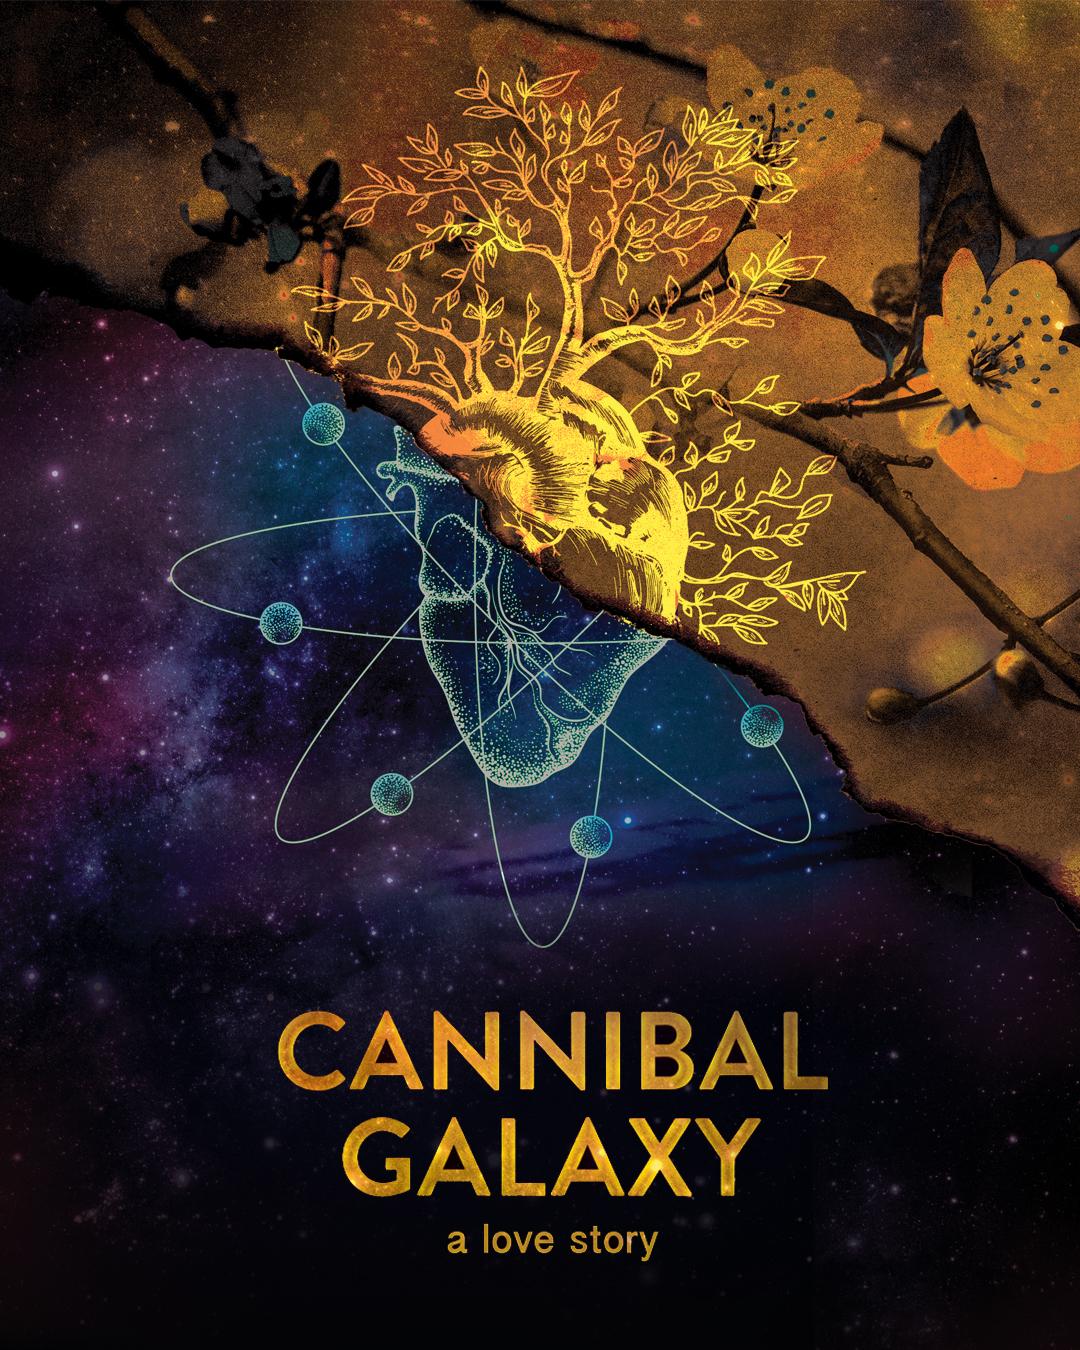 Cannibal Galaxy